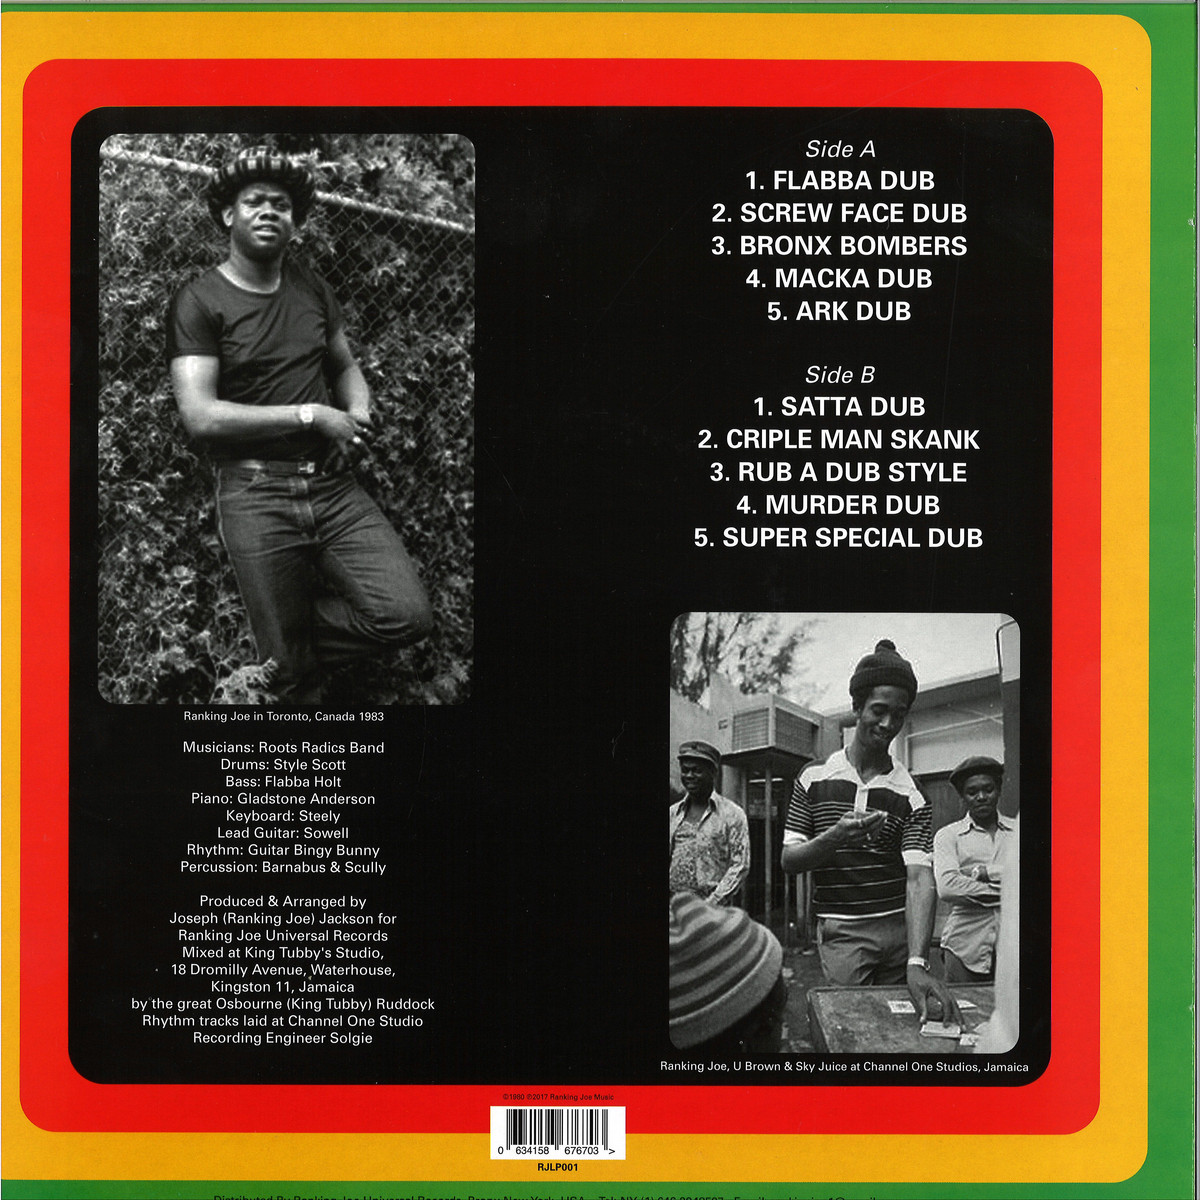 Errol Flabba Holt - Roots Radics Dub / Ranking Joe RJLP001 - Vinyl